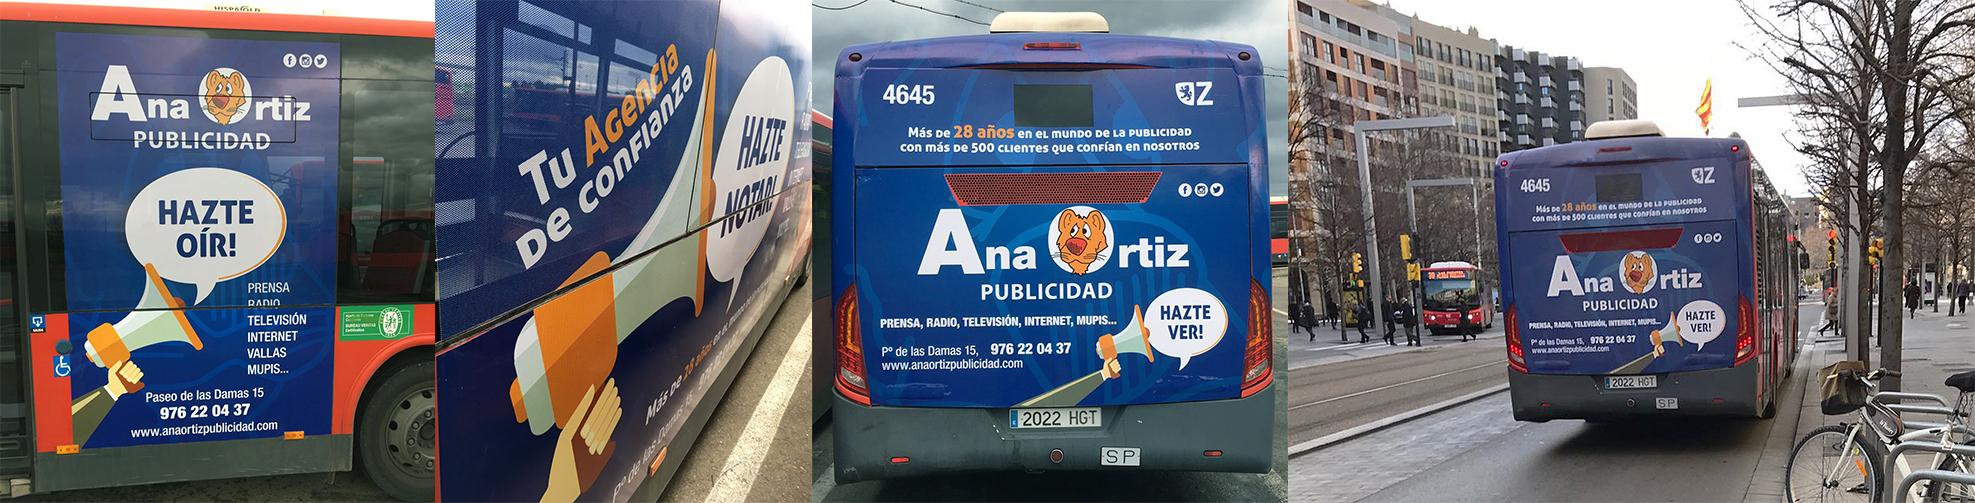 Autobús Plus Zaragoza - Ana Ortiz Publicidad